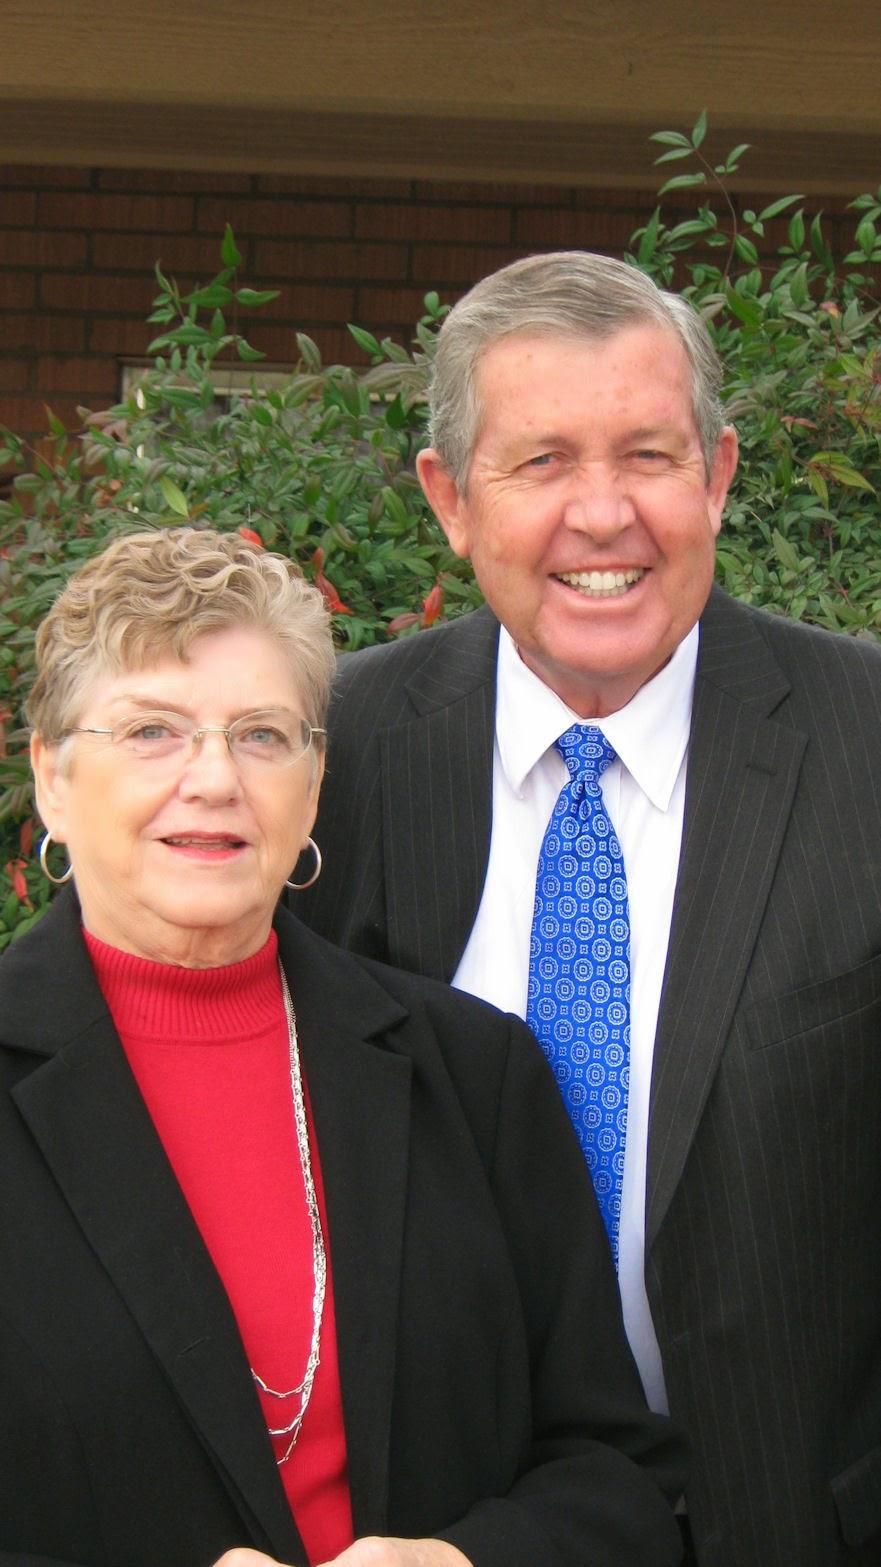 Darryl & Carolyn Dunn